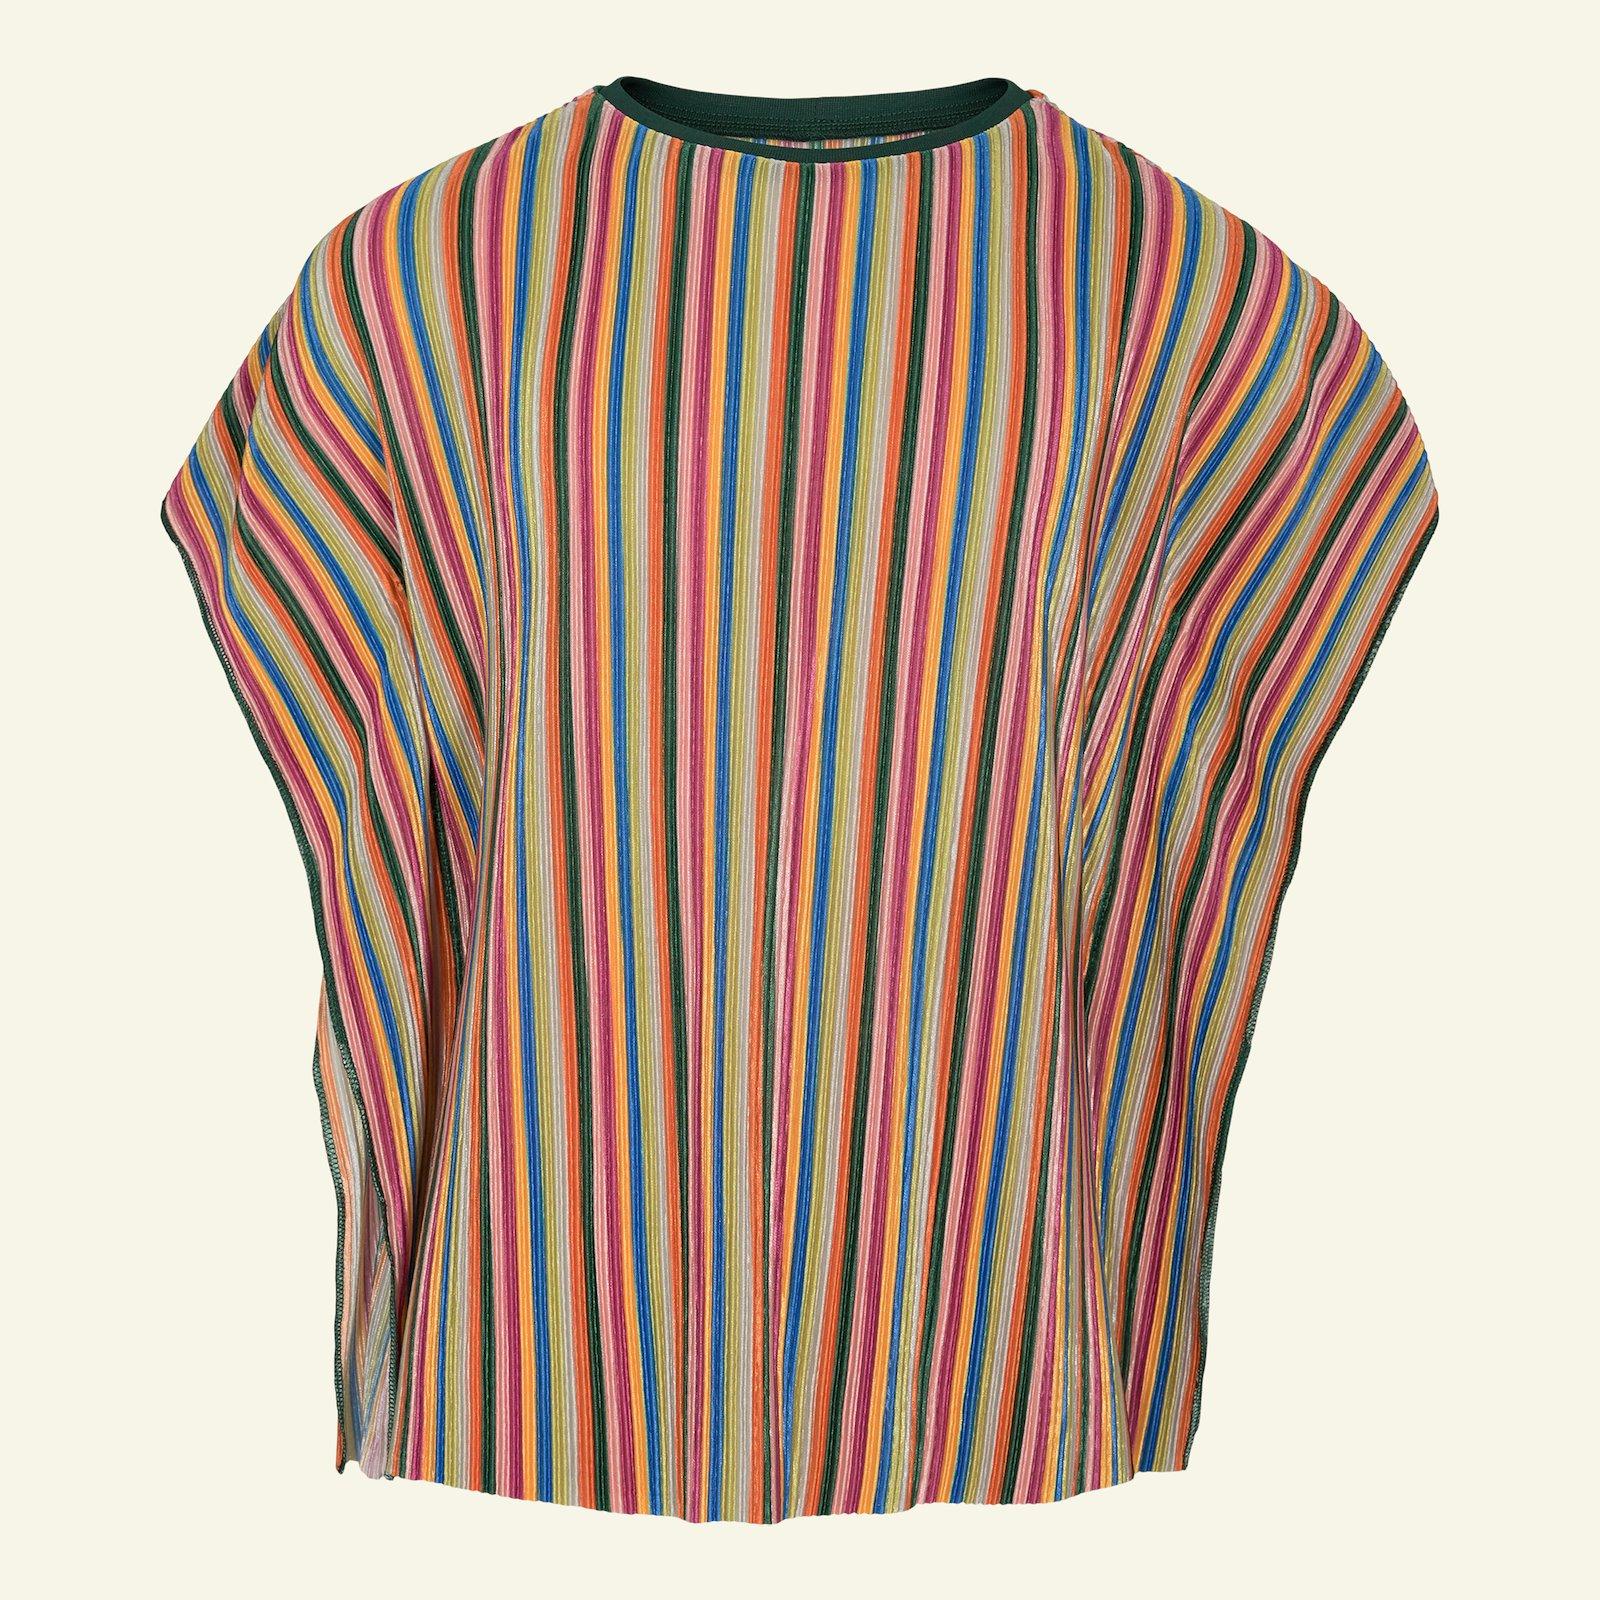 Pleats with multicolored stripe p63057_280105_230627_sskit